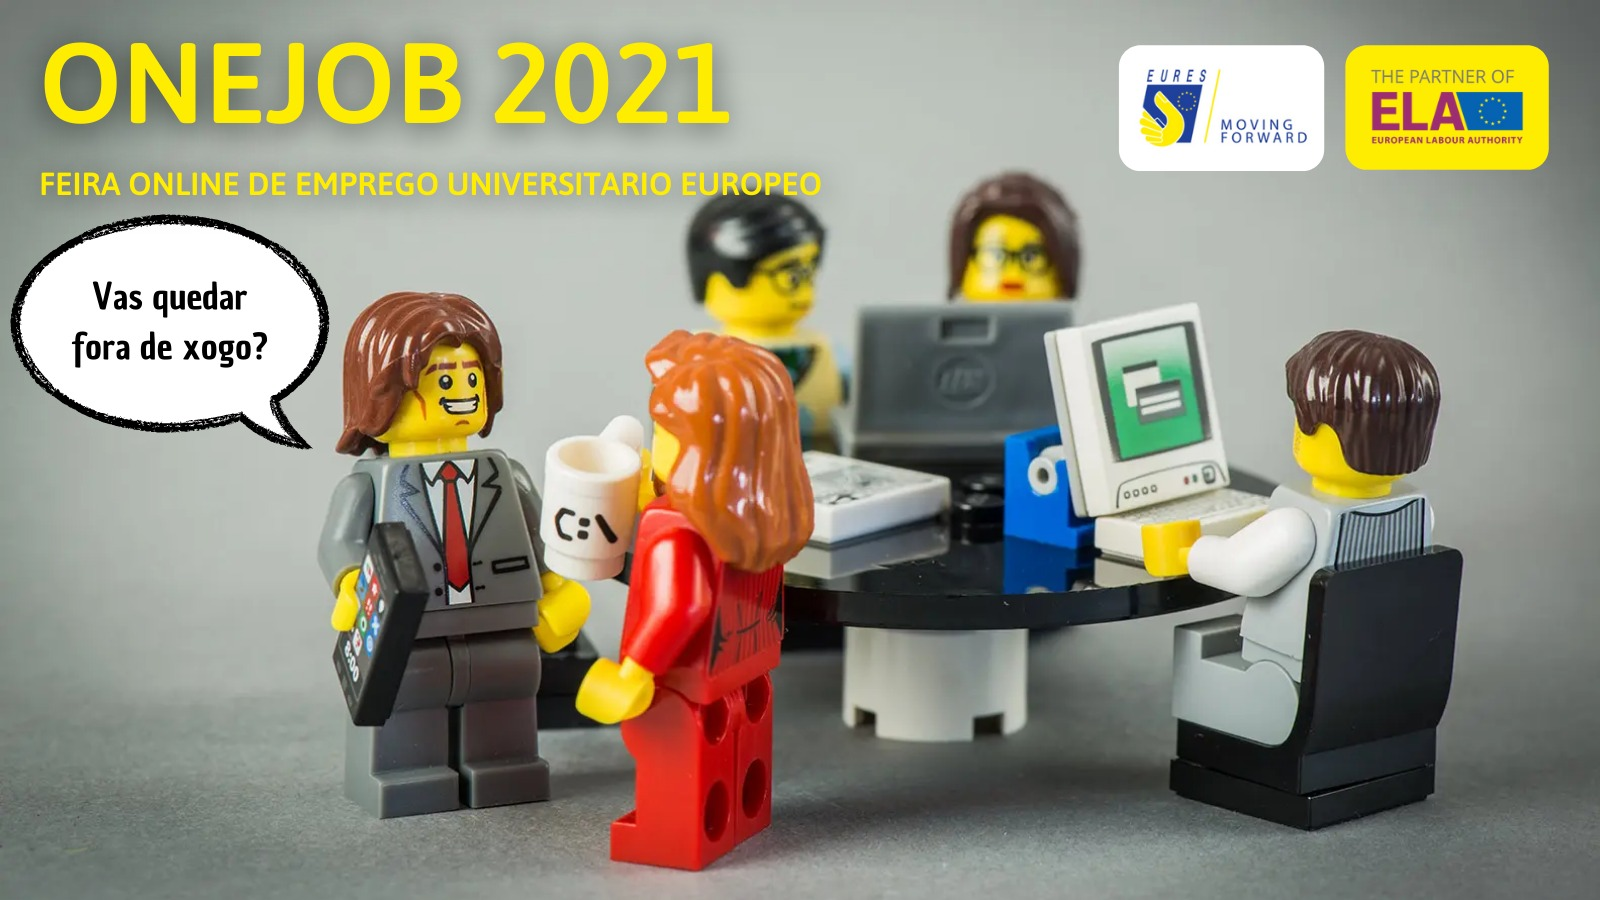 Onejob 2021